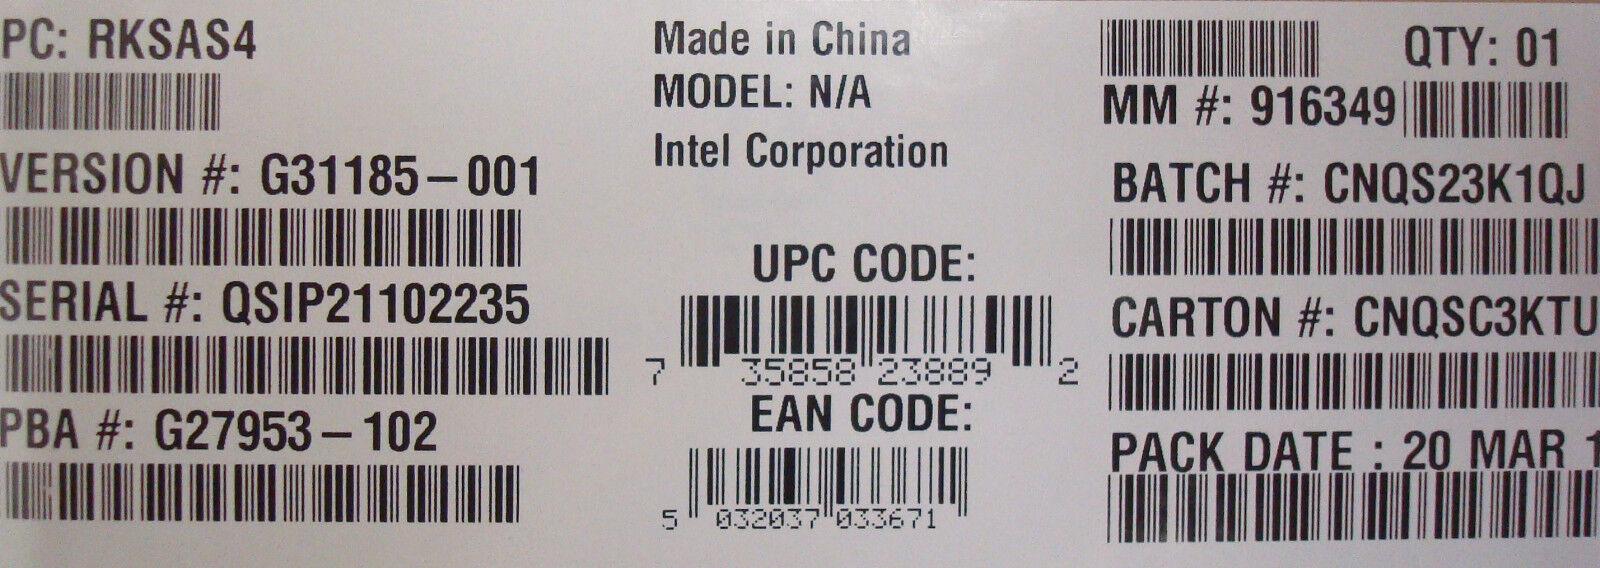 Intel RKSAS4 RAID SAS C600 PCIe SG27953 Upgrade Key New Bulk Packaging